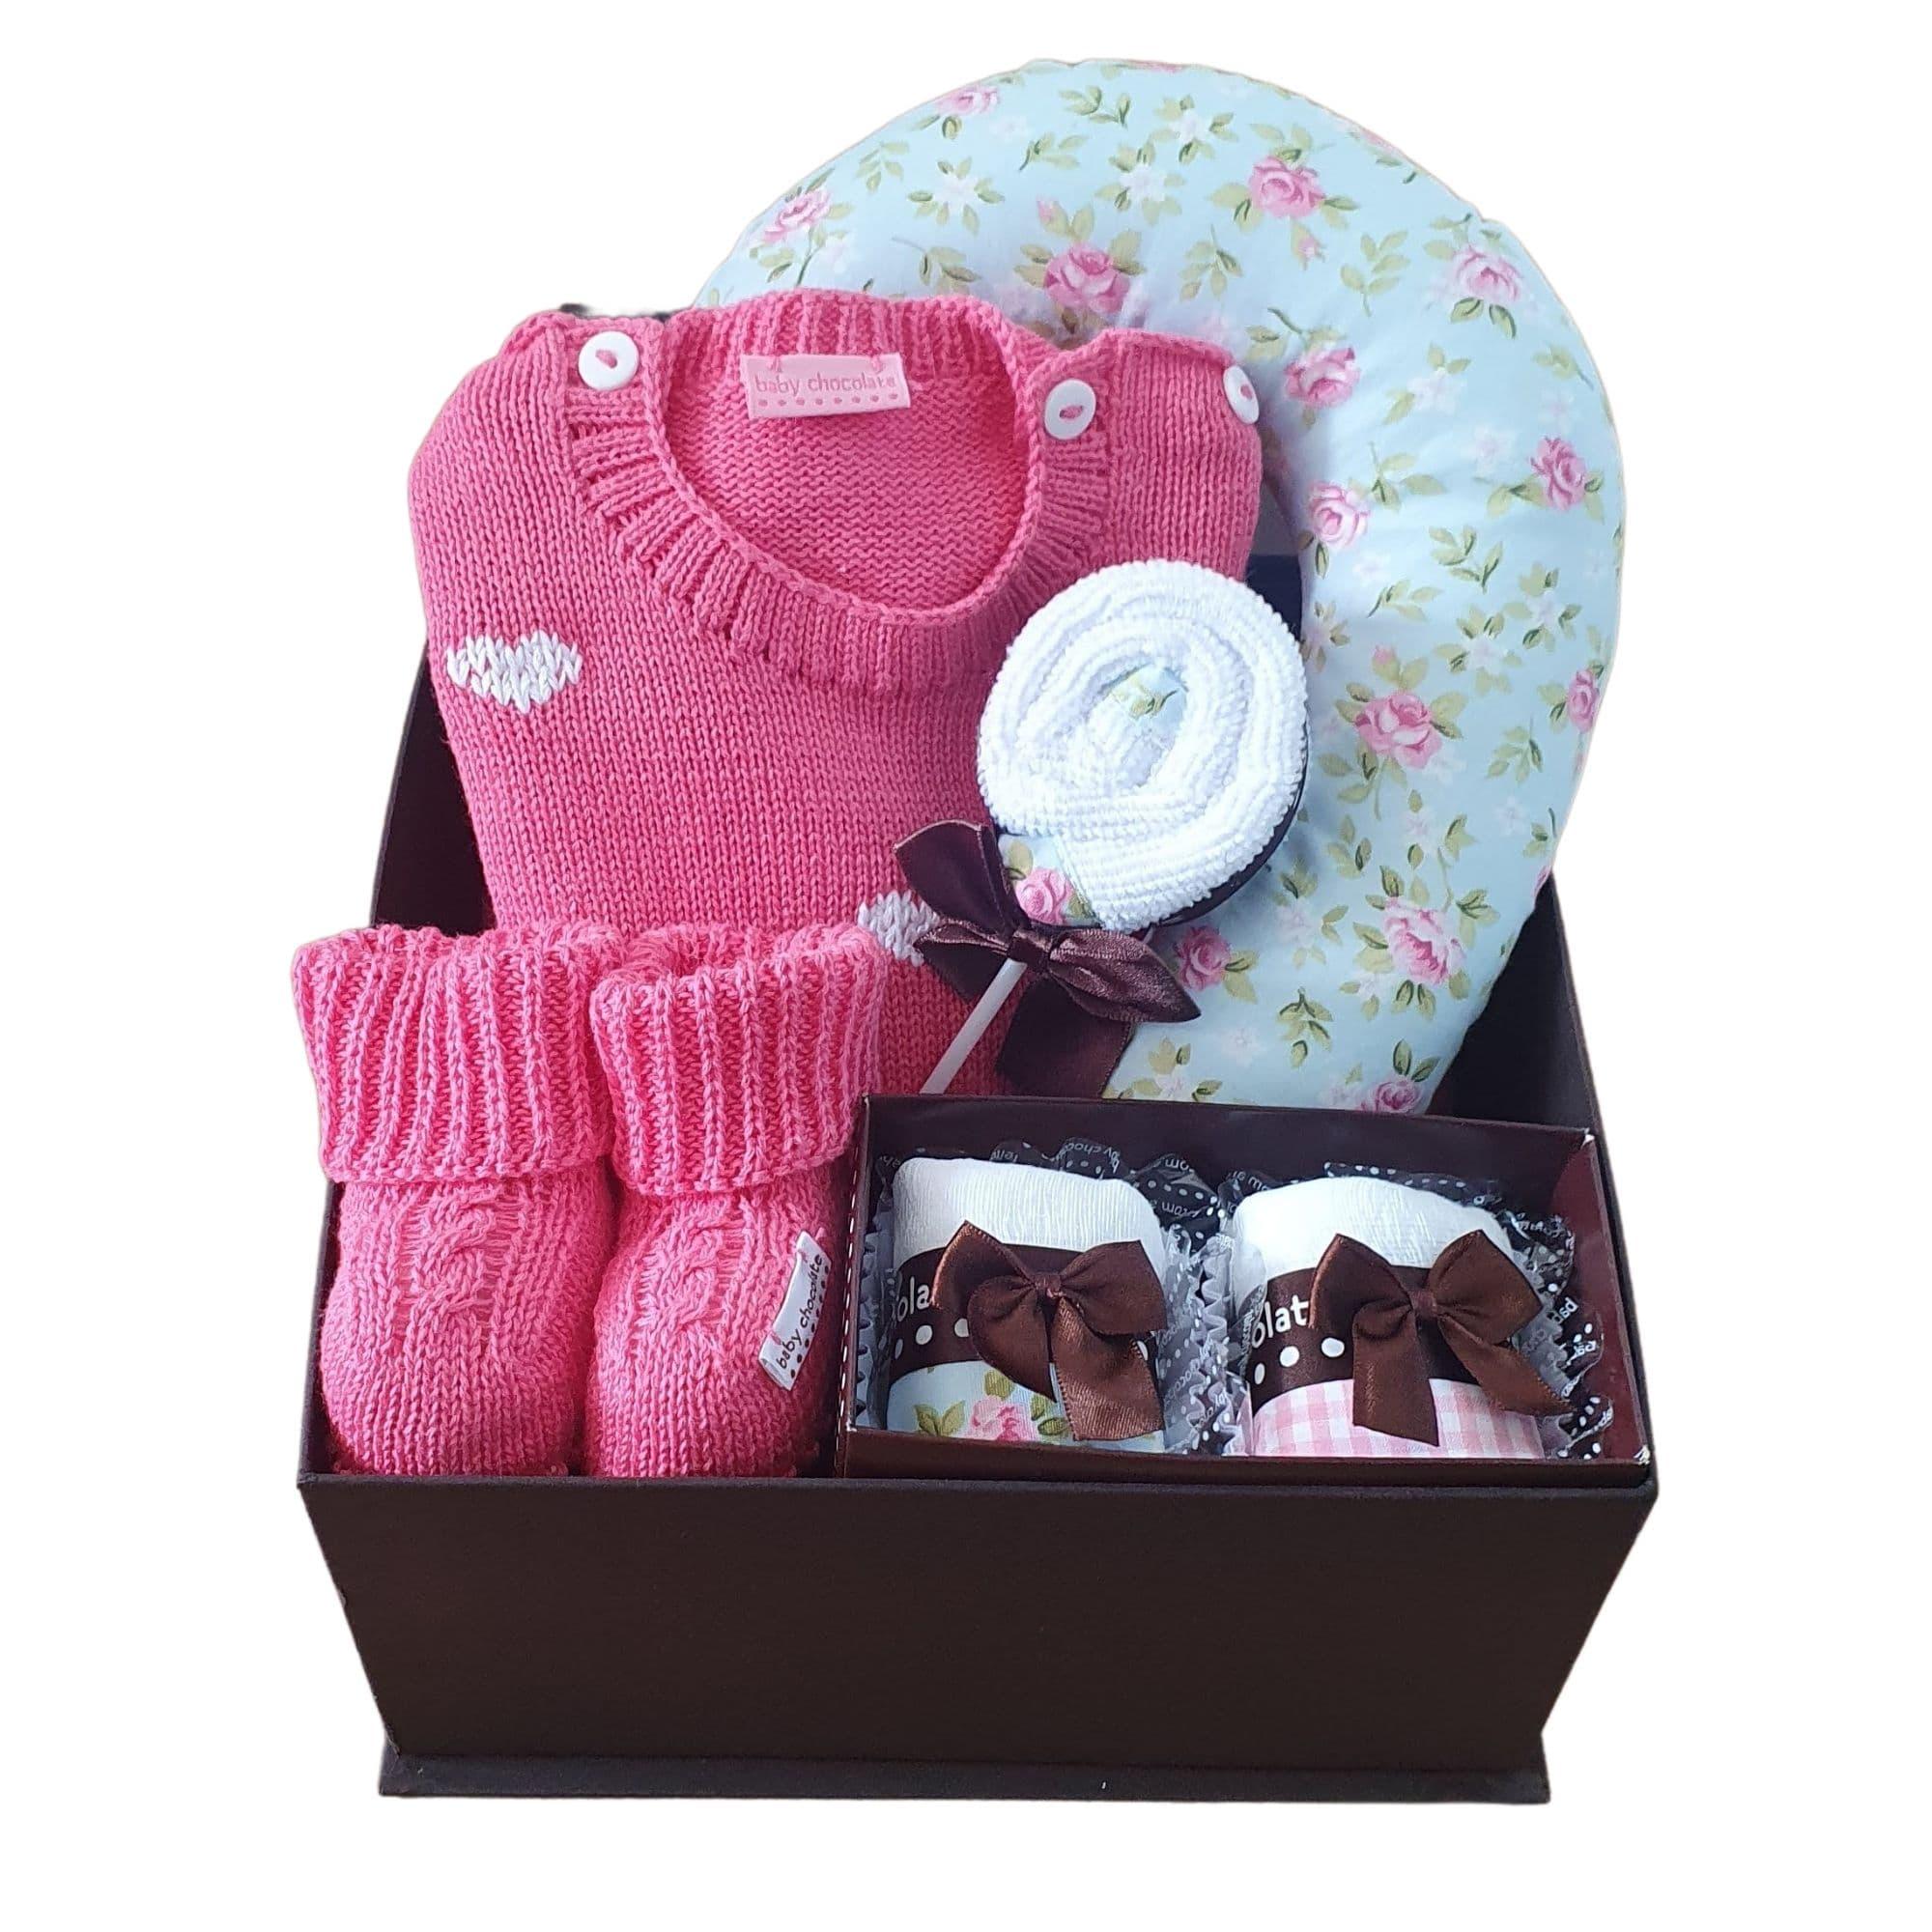 Caixa Presente Bebê Completa Candy